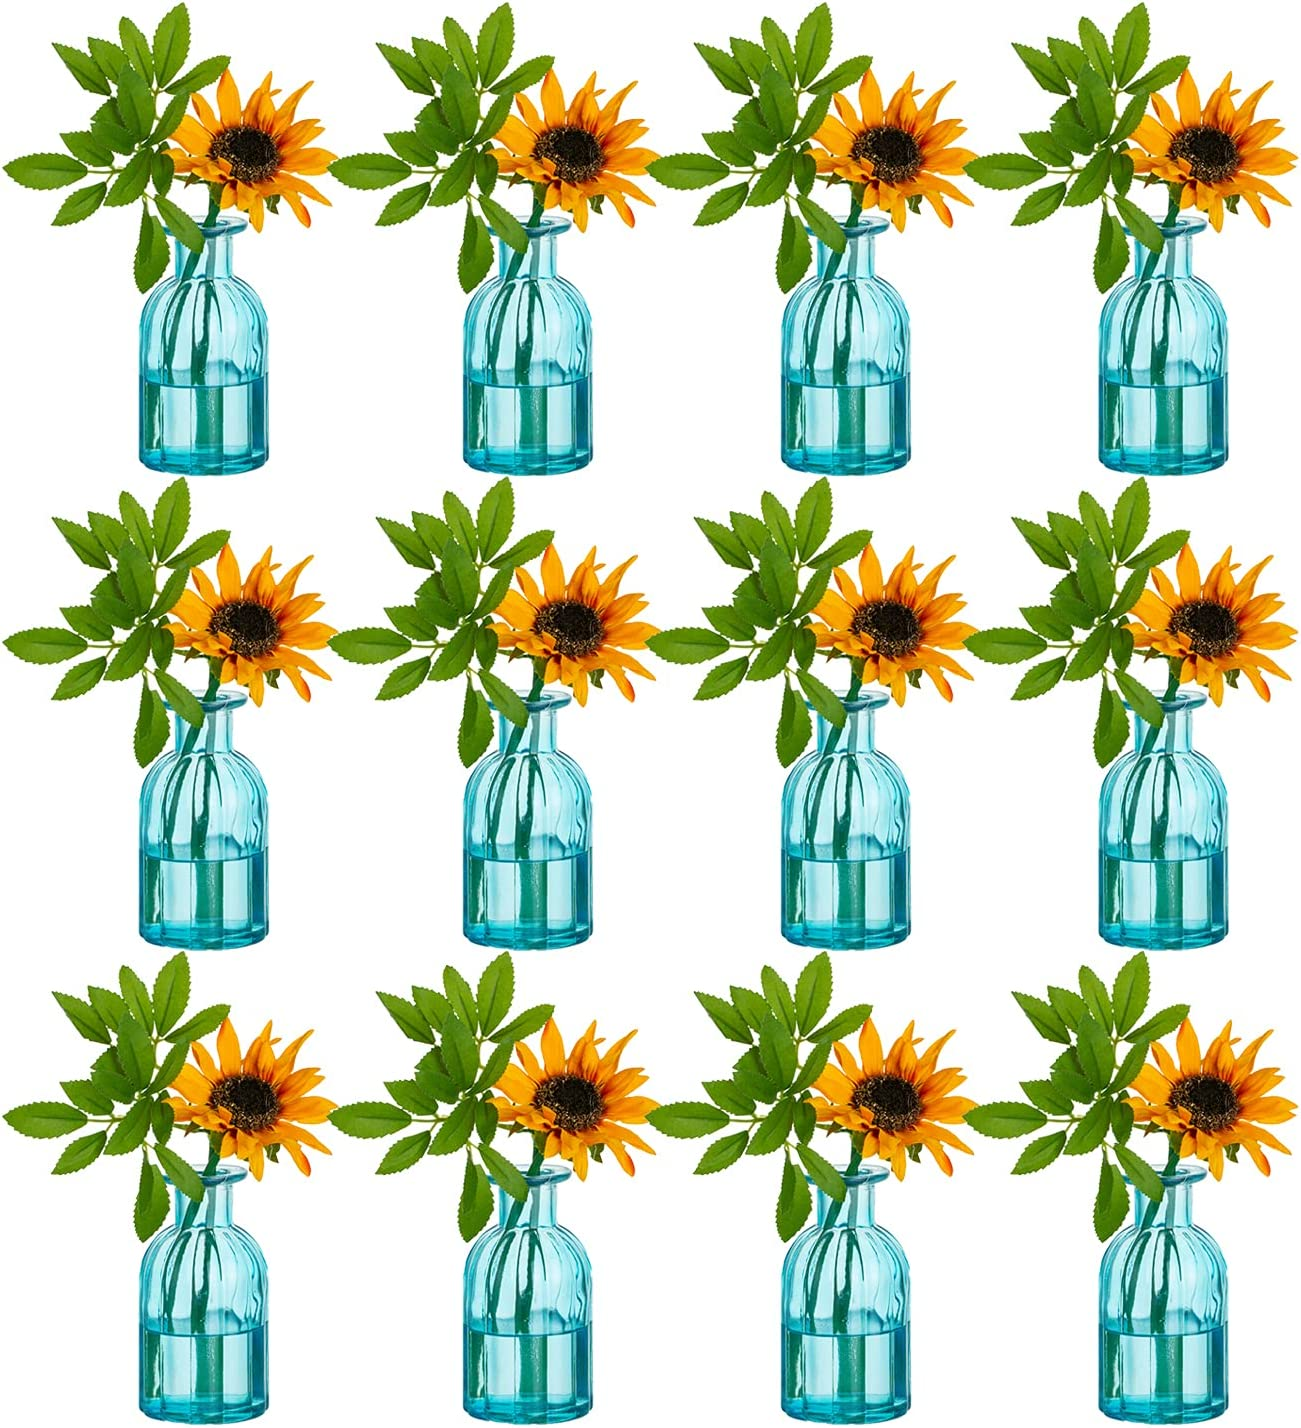 Glass Cylinder Vases Stripe 12Pcs for Centerpieces, Blue Bud Vases, Decorative Glass Bottles Flower with Vase for Dining Table Home Wedding Decor